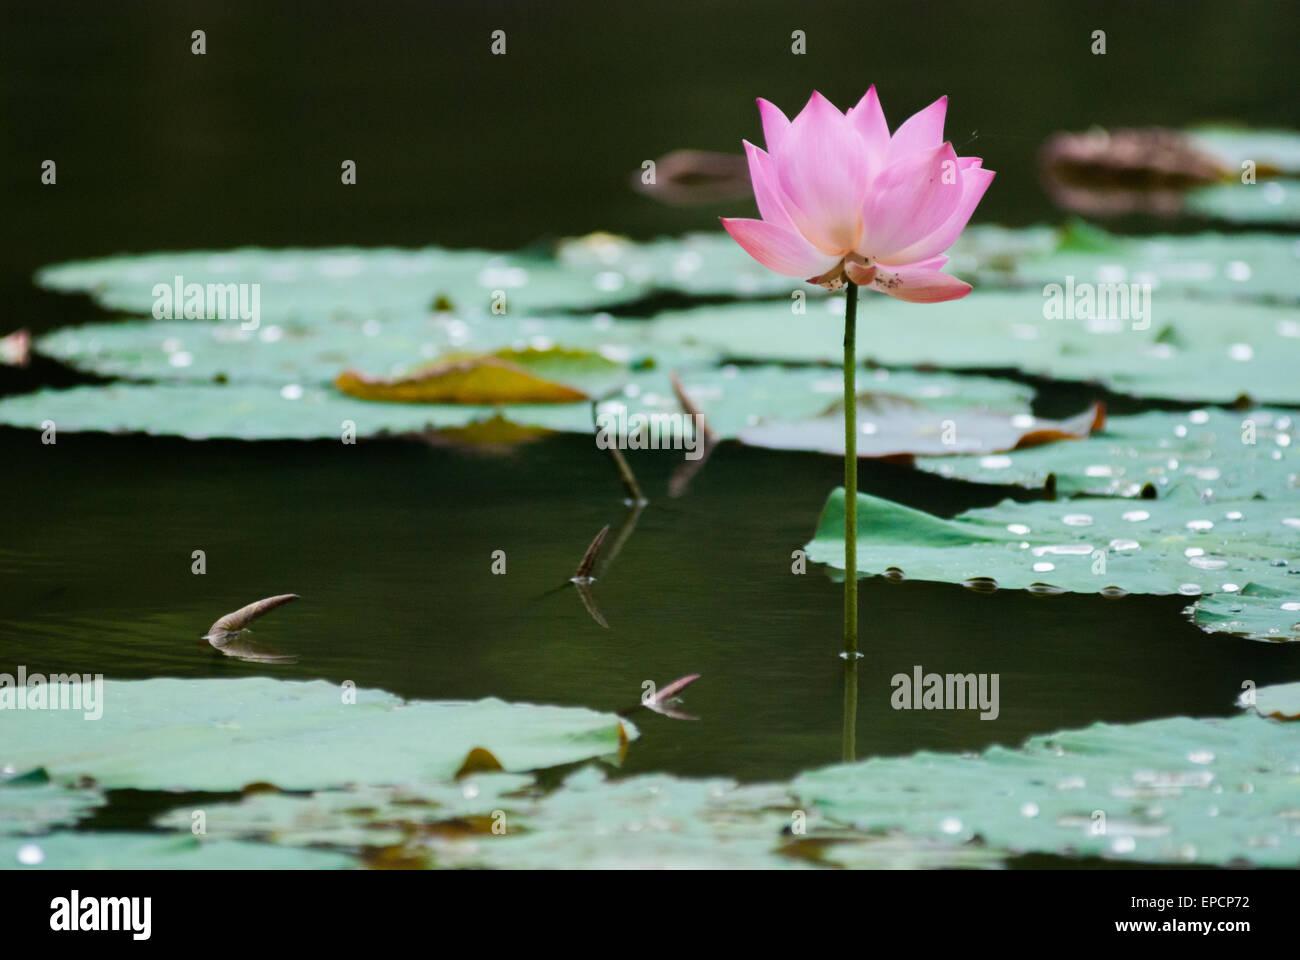 east indian lotus nelumbo nucifera stock photos & east indian lotus